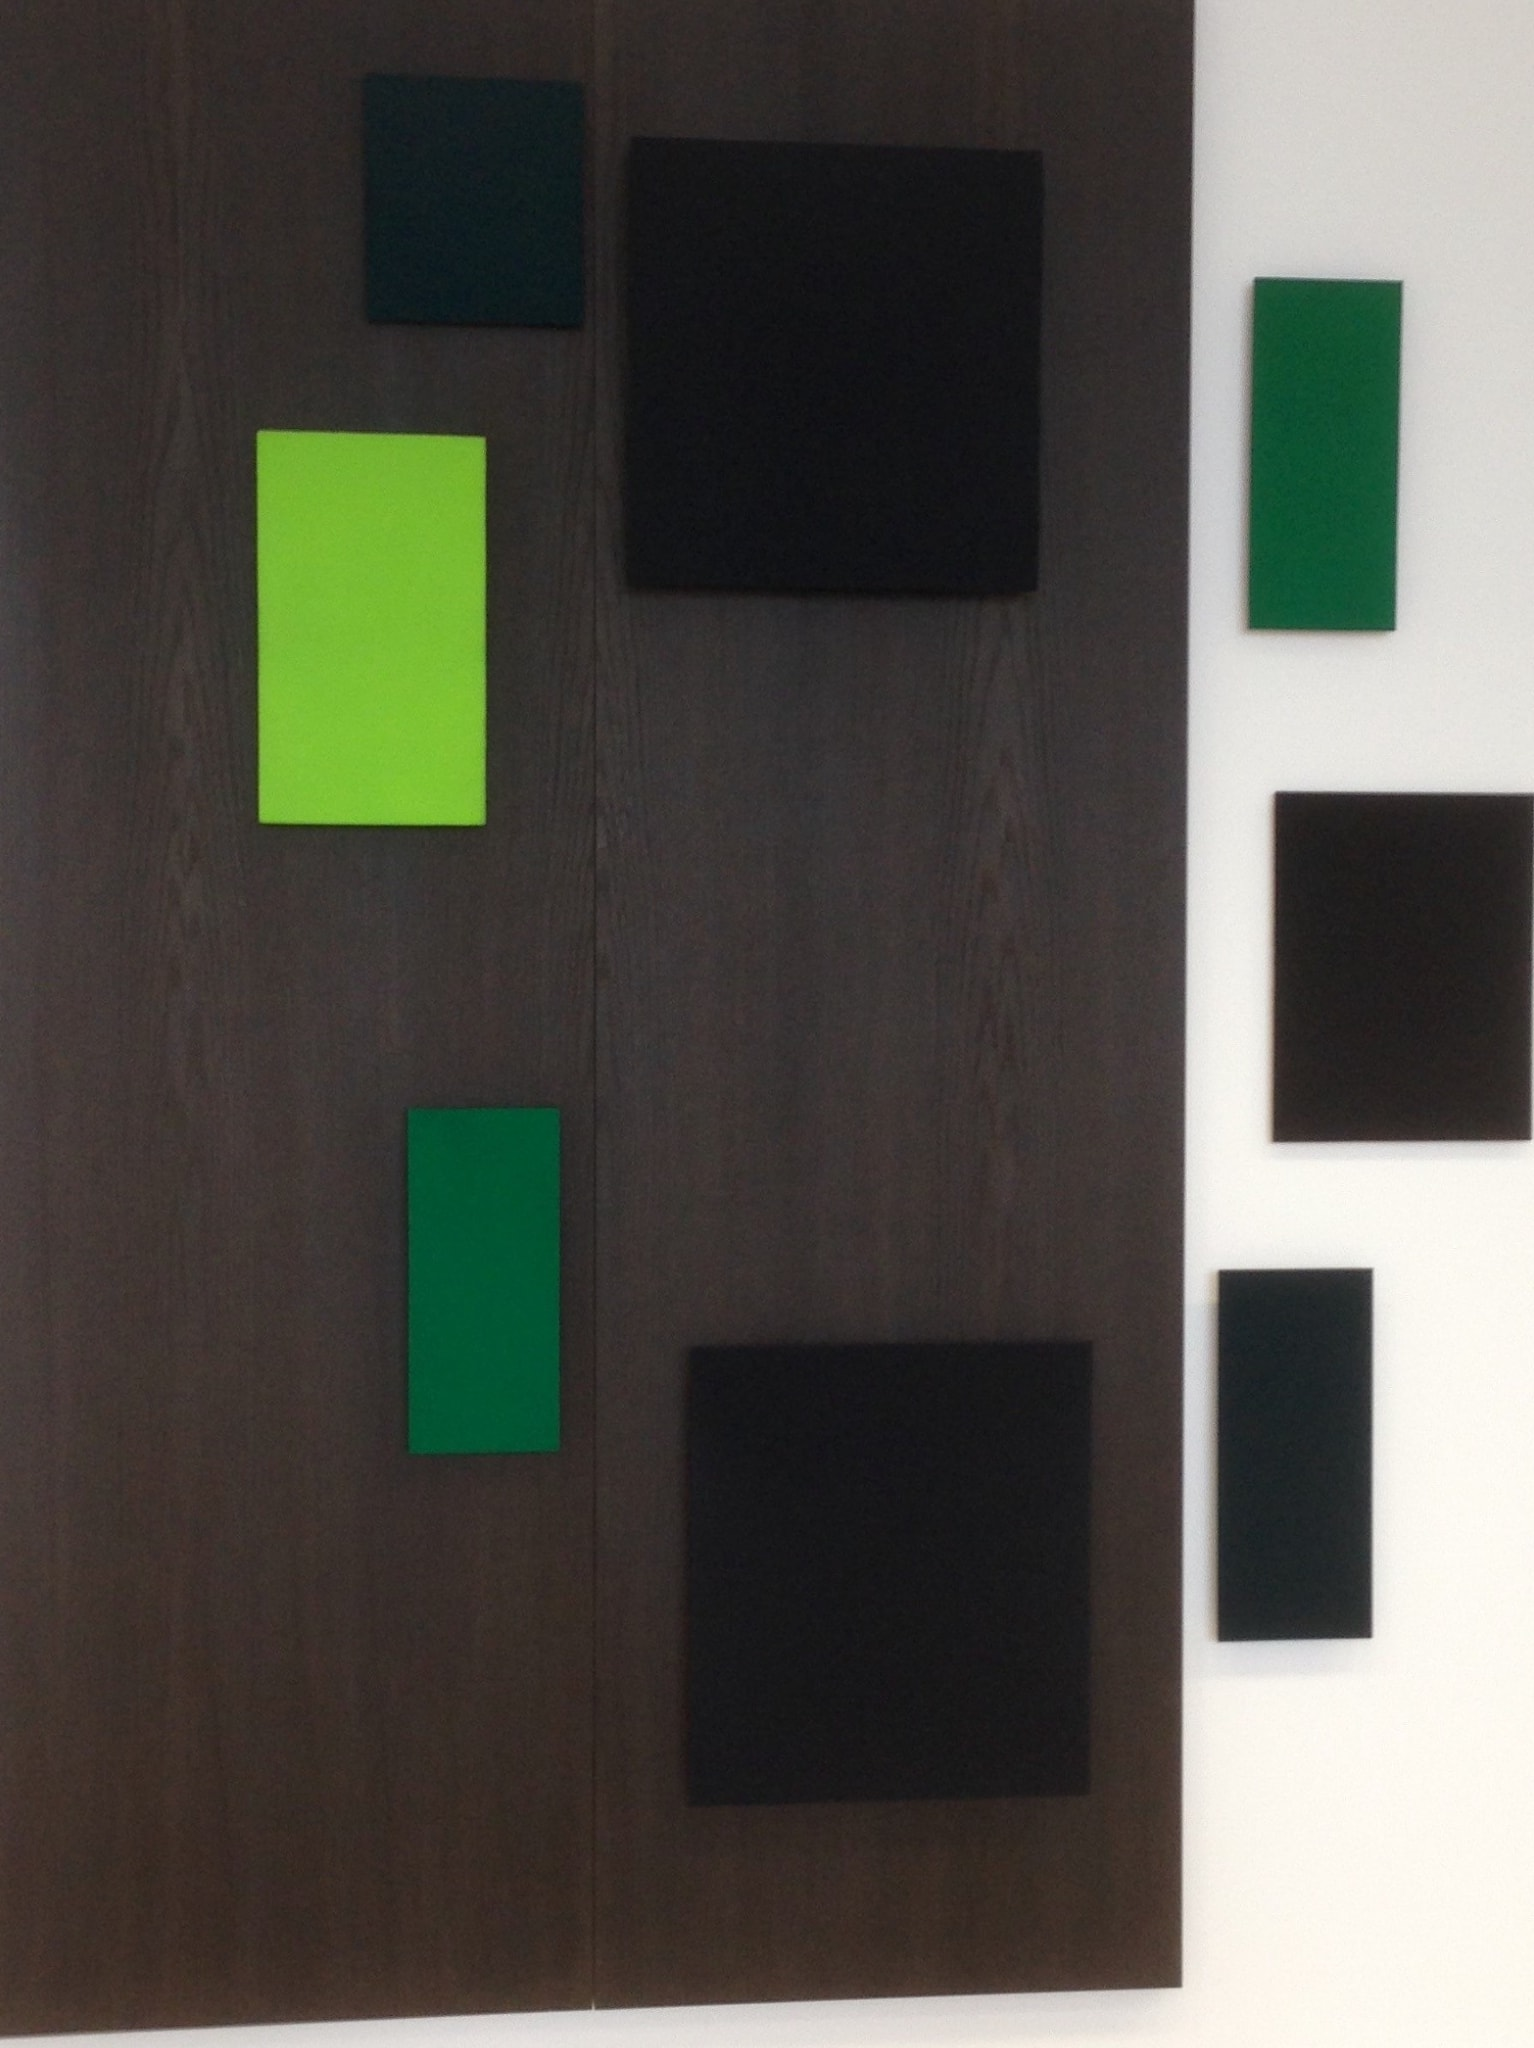 PLAN 5 by Günter Umberg